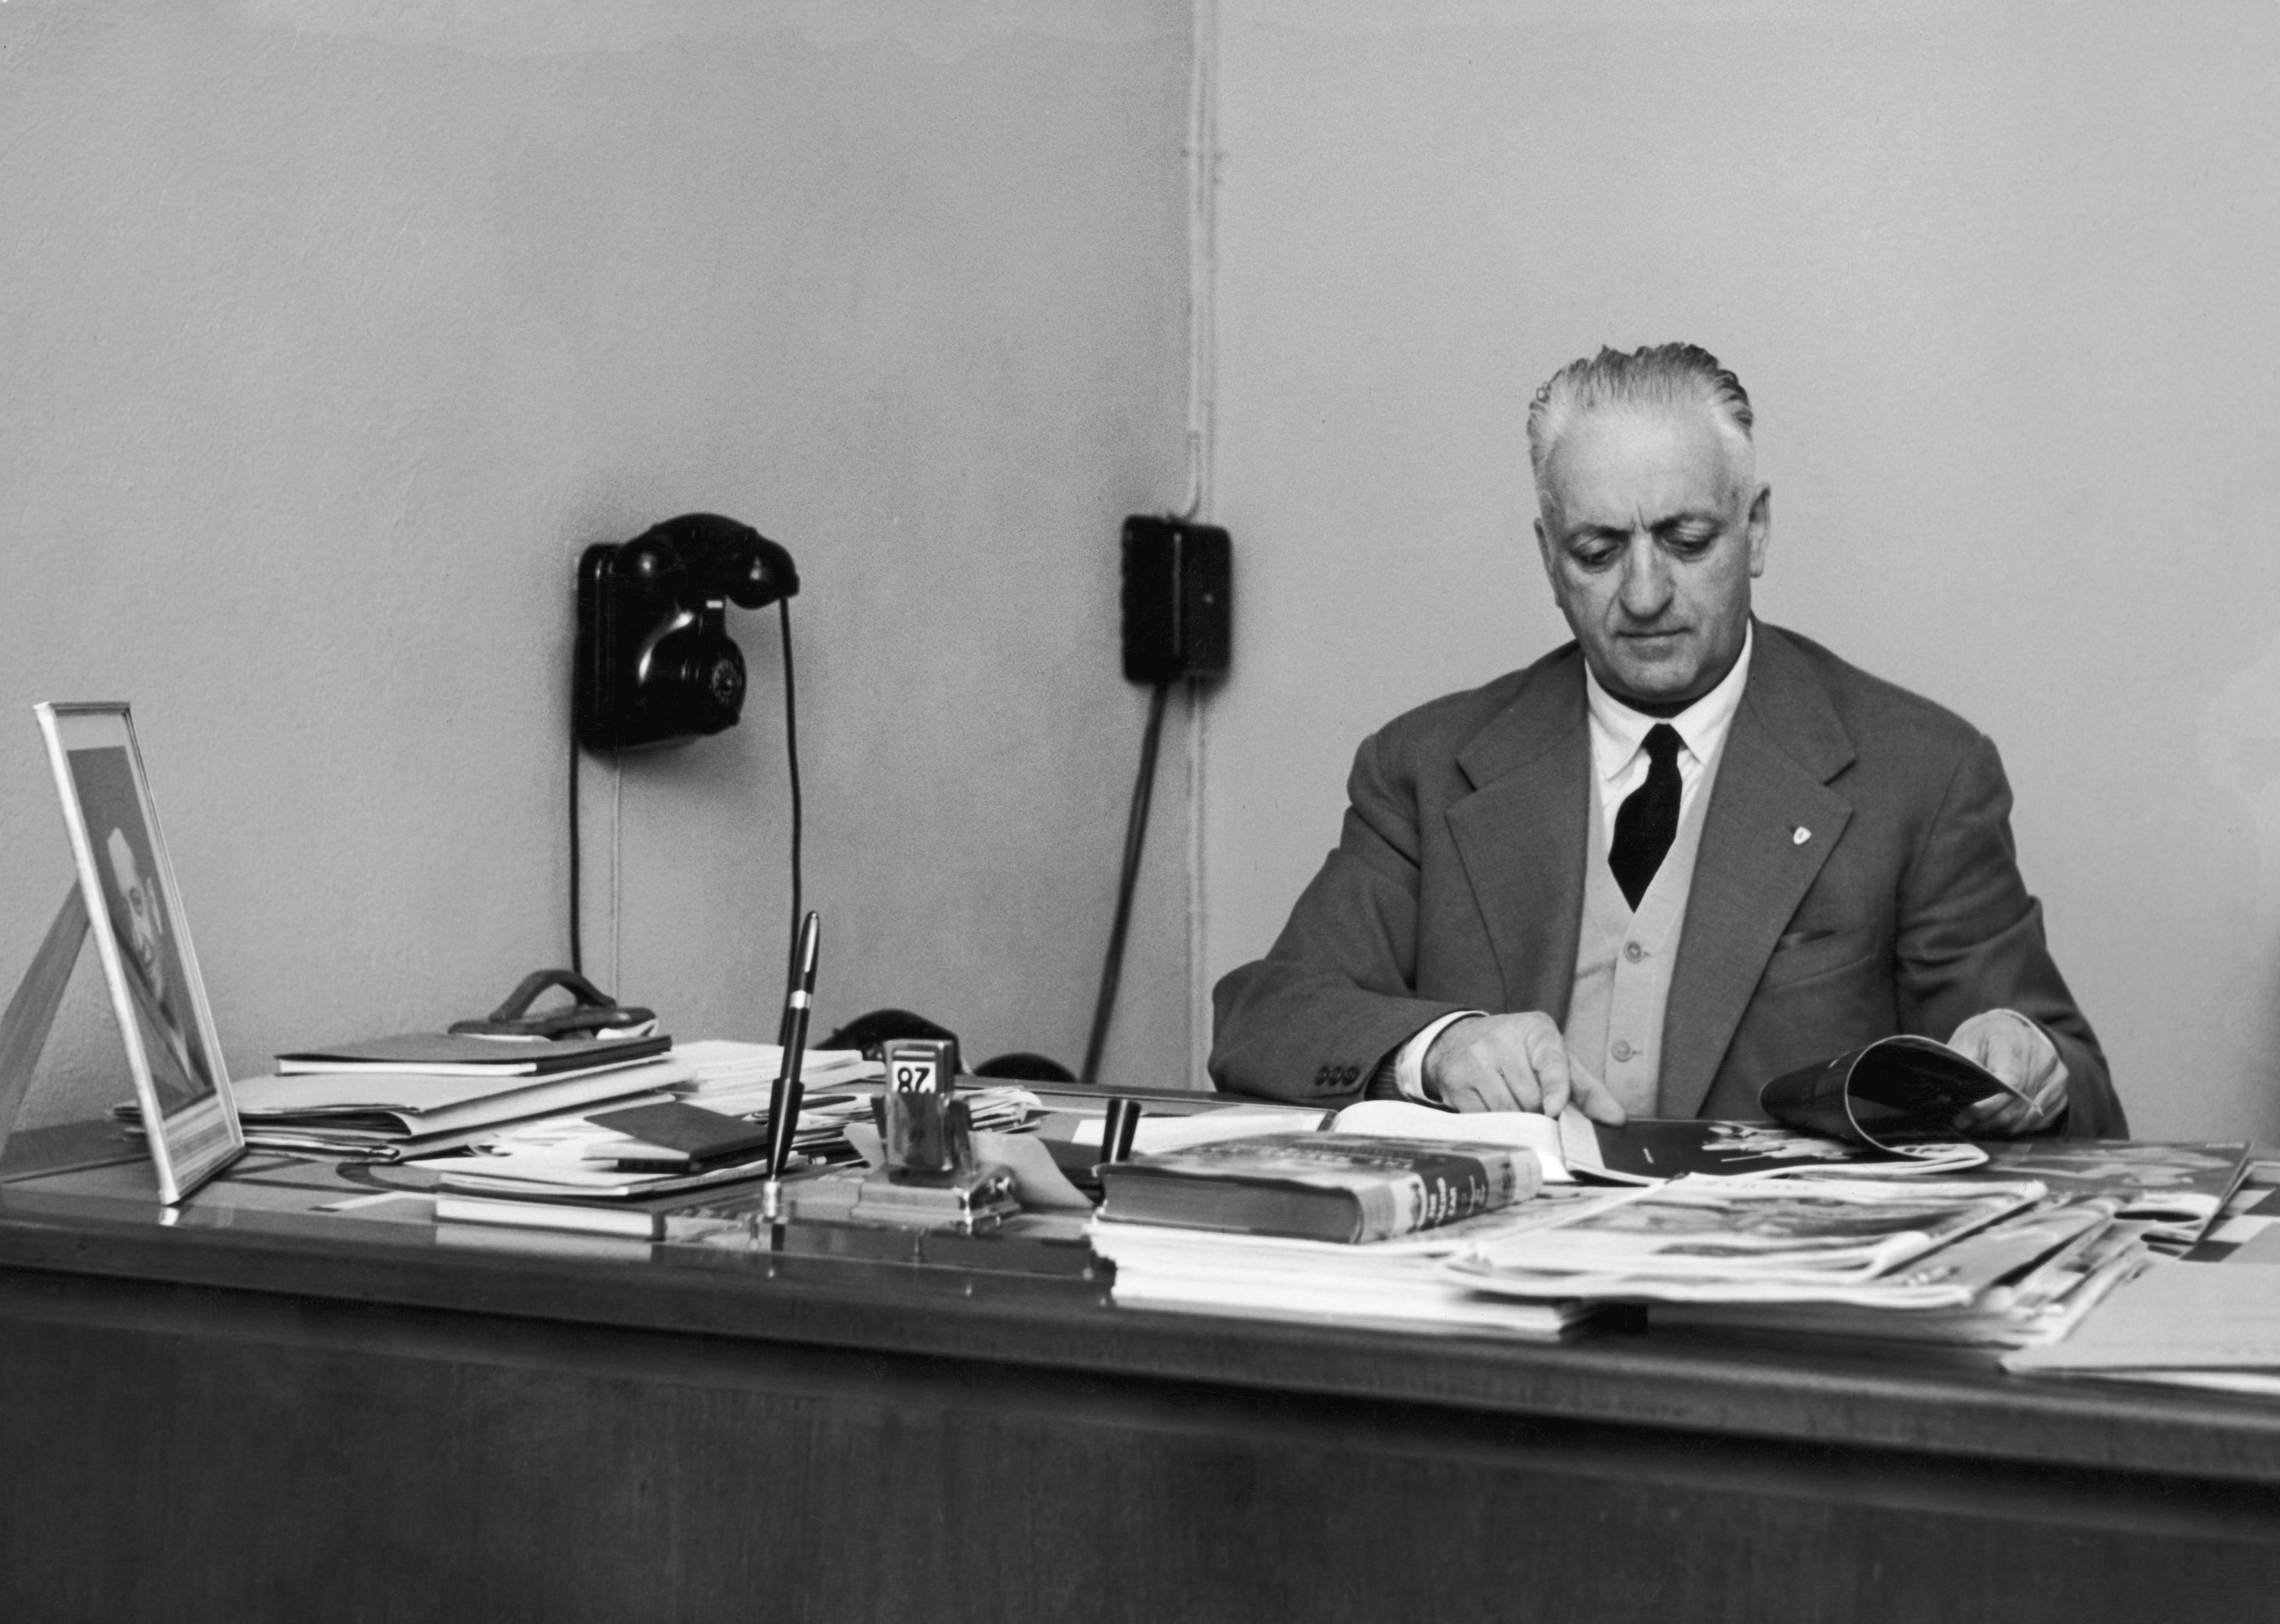 Italian car manufacturer Enzo Ferrari (1898 - 1988) at his desk, circa 1955.